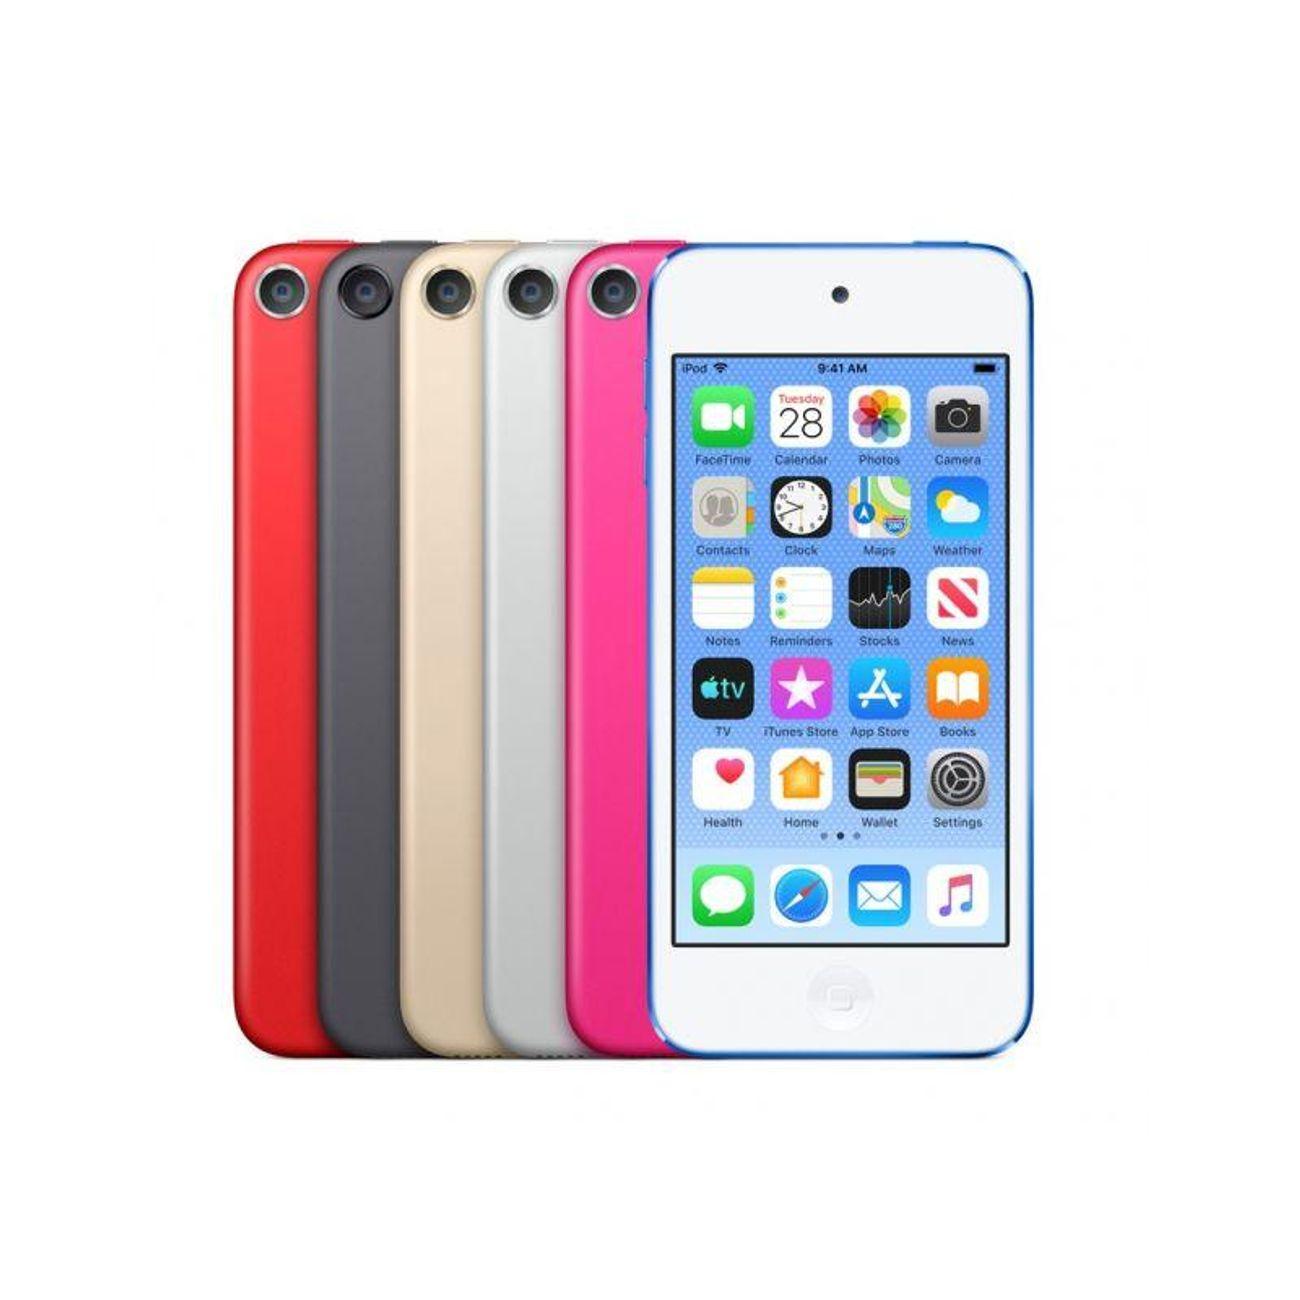 NO NAME Apple iPod touch Silber 128GB 7.Gen. MVJ52FD/A